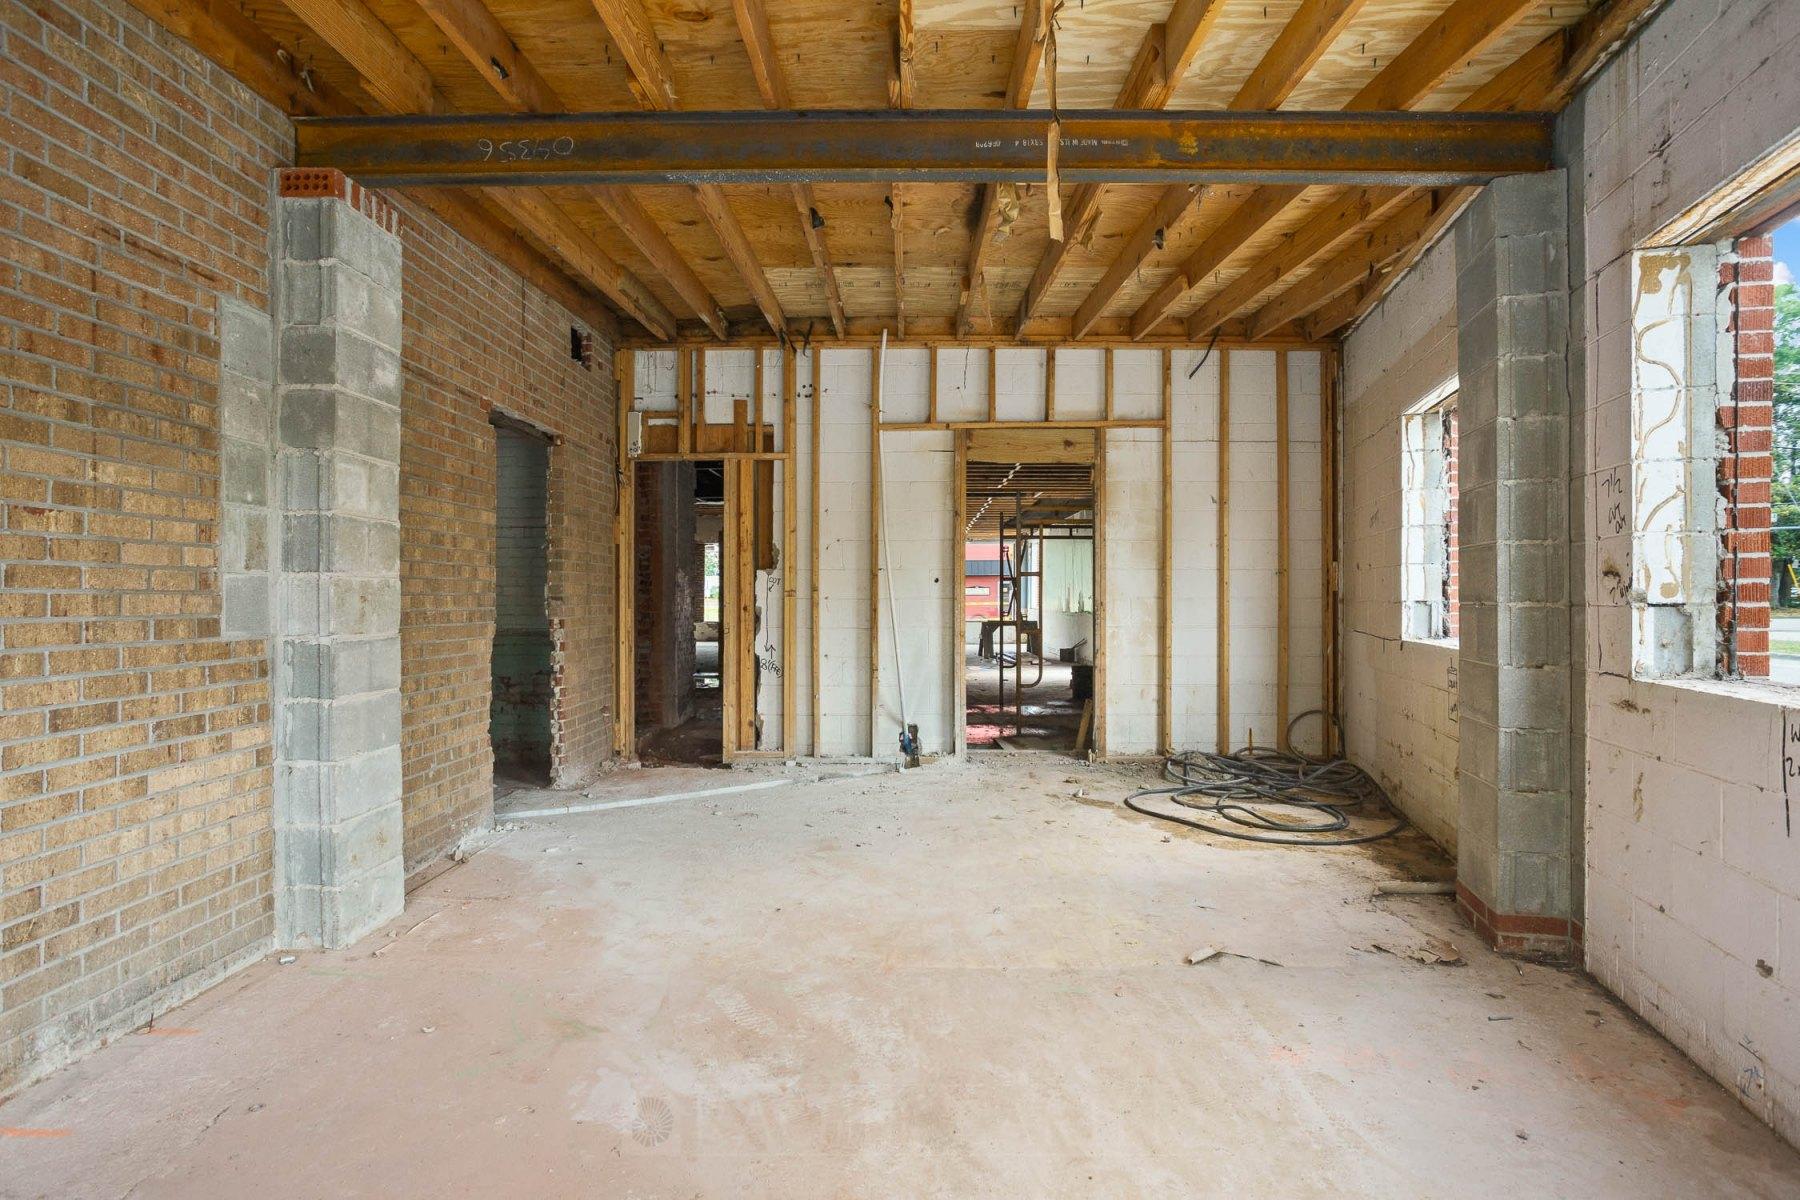 Horizons-East-Office-Renovation-1st-Set-27May2021_SB_01281_web-size